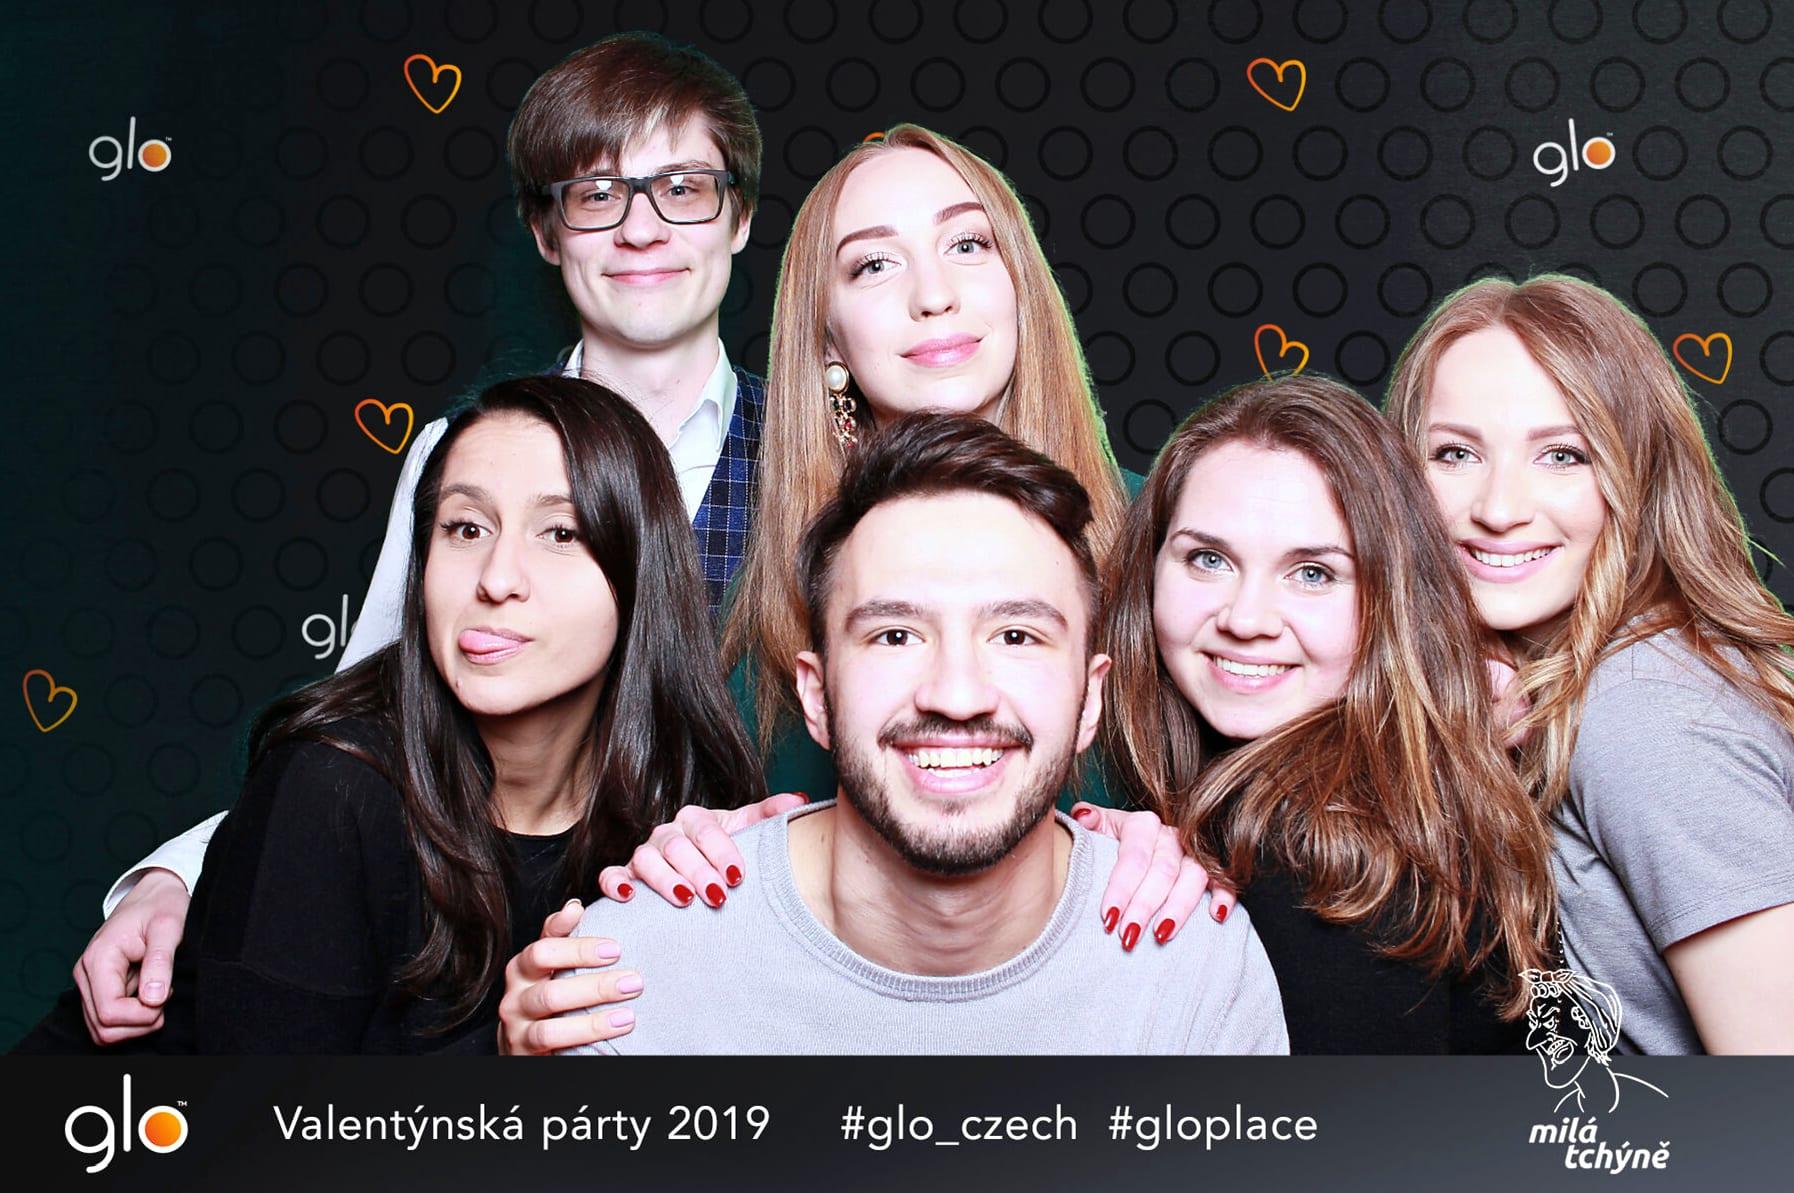 fotokoutek-glo-mila-tchyne-15-2-2019-581810